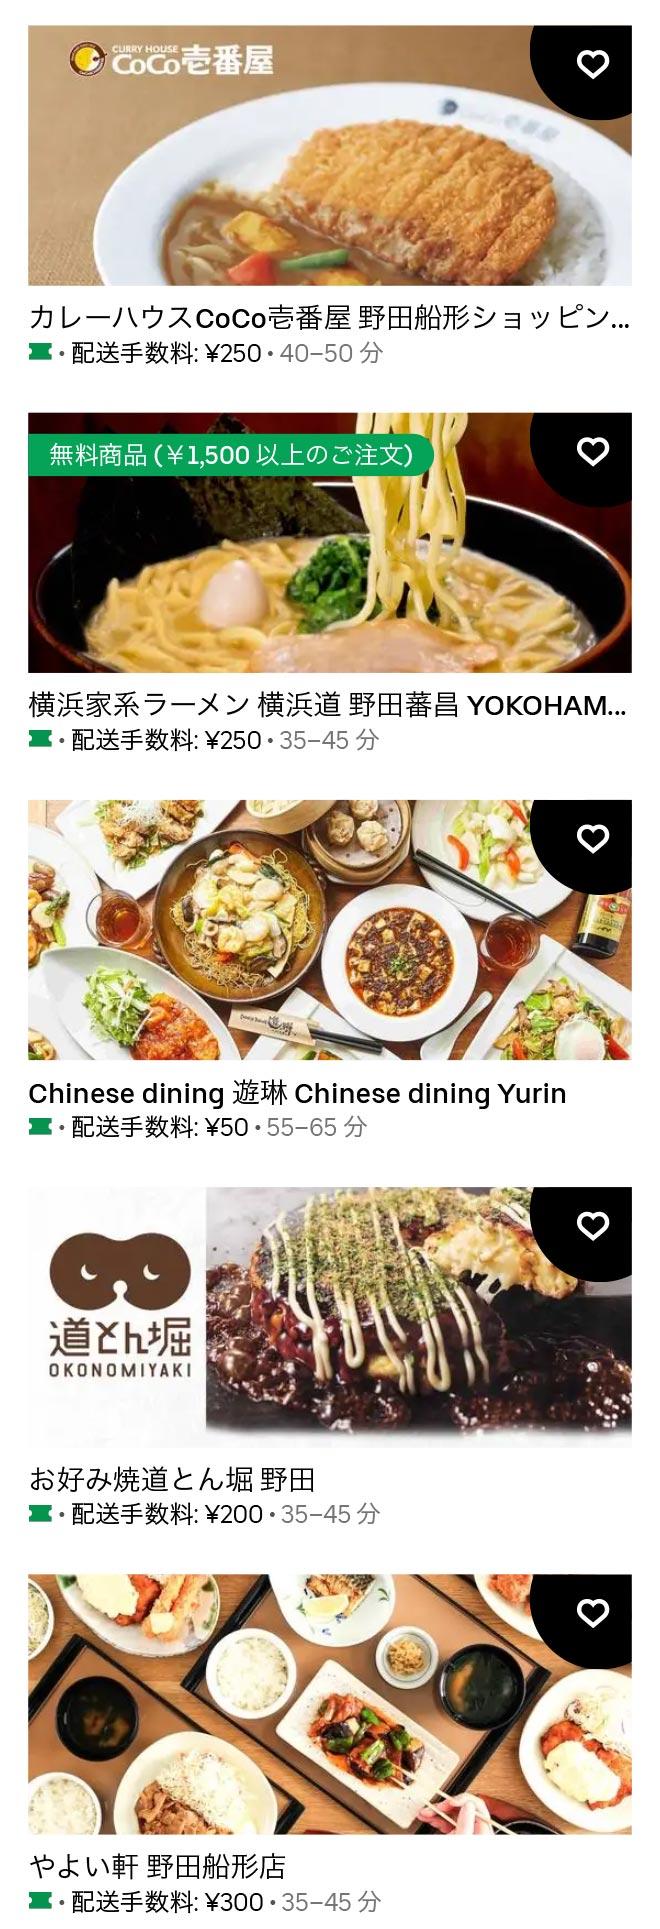 U kawama menu 2104 03